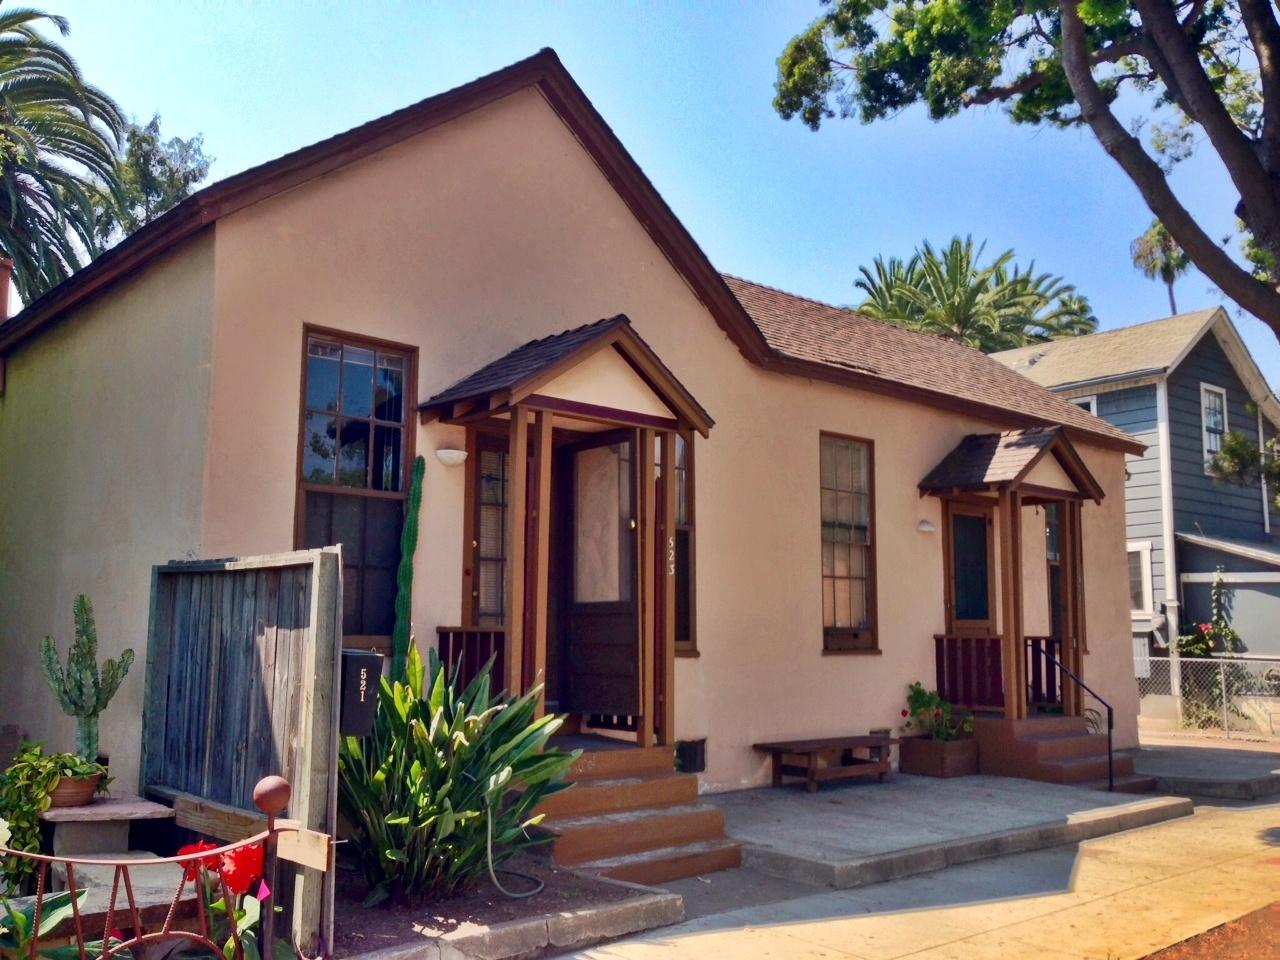 Property photo for 523 Santa Barbara St Santa Barbara, California 93101 - 13-3058